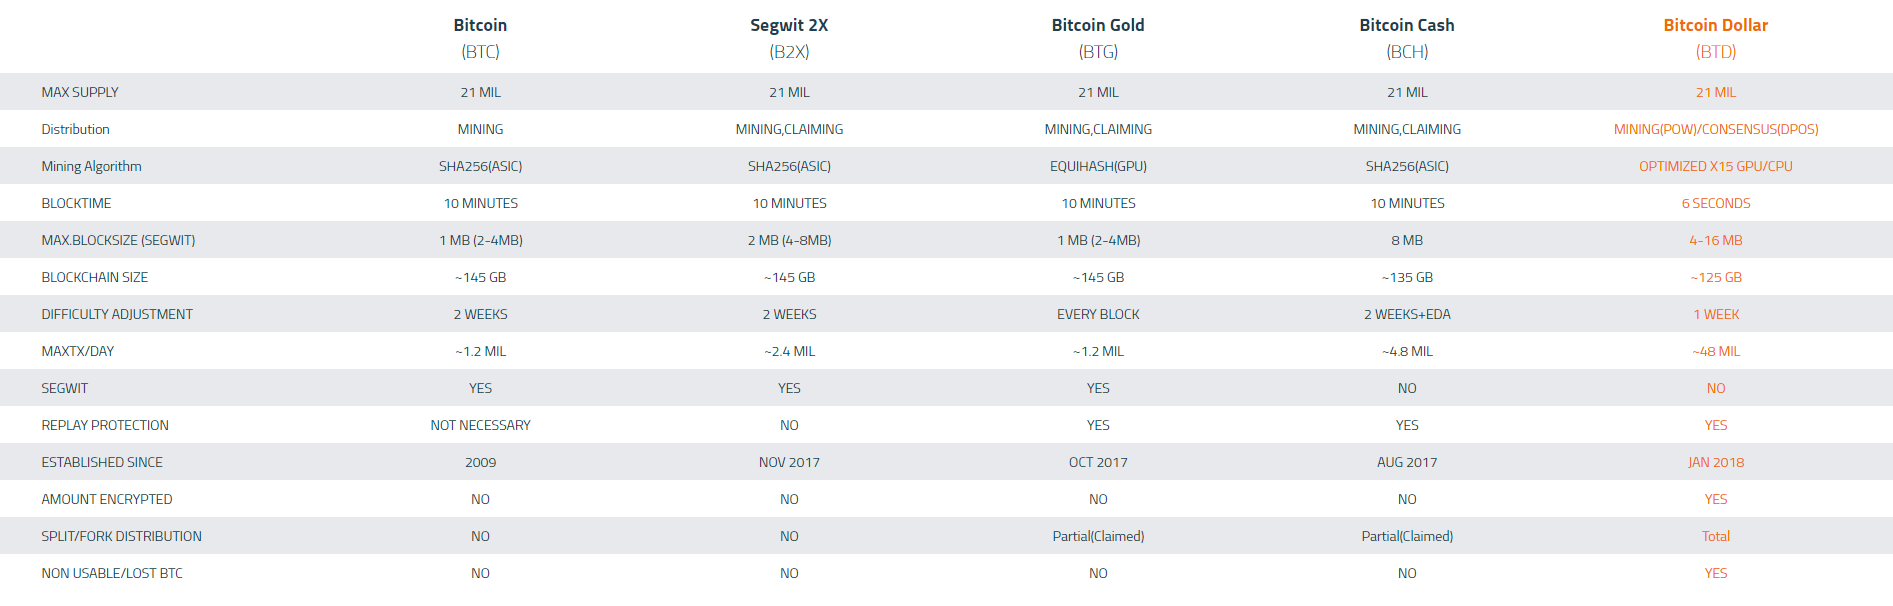 Bitcoin Dollar по сравнению с другими форками биткоина